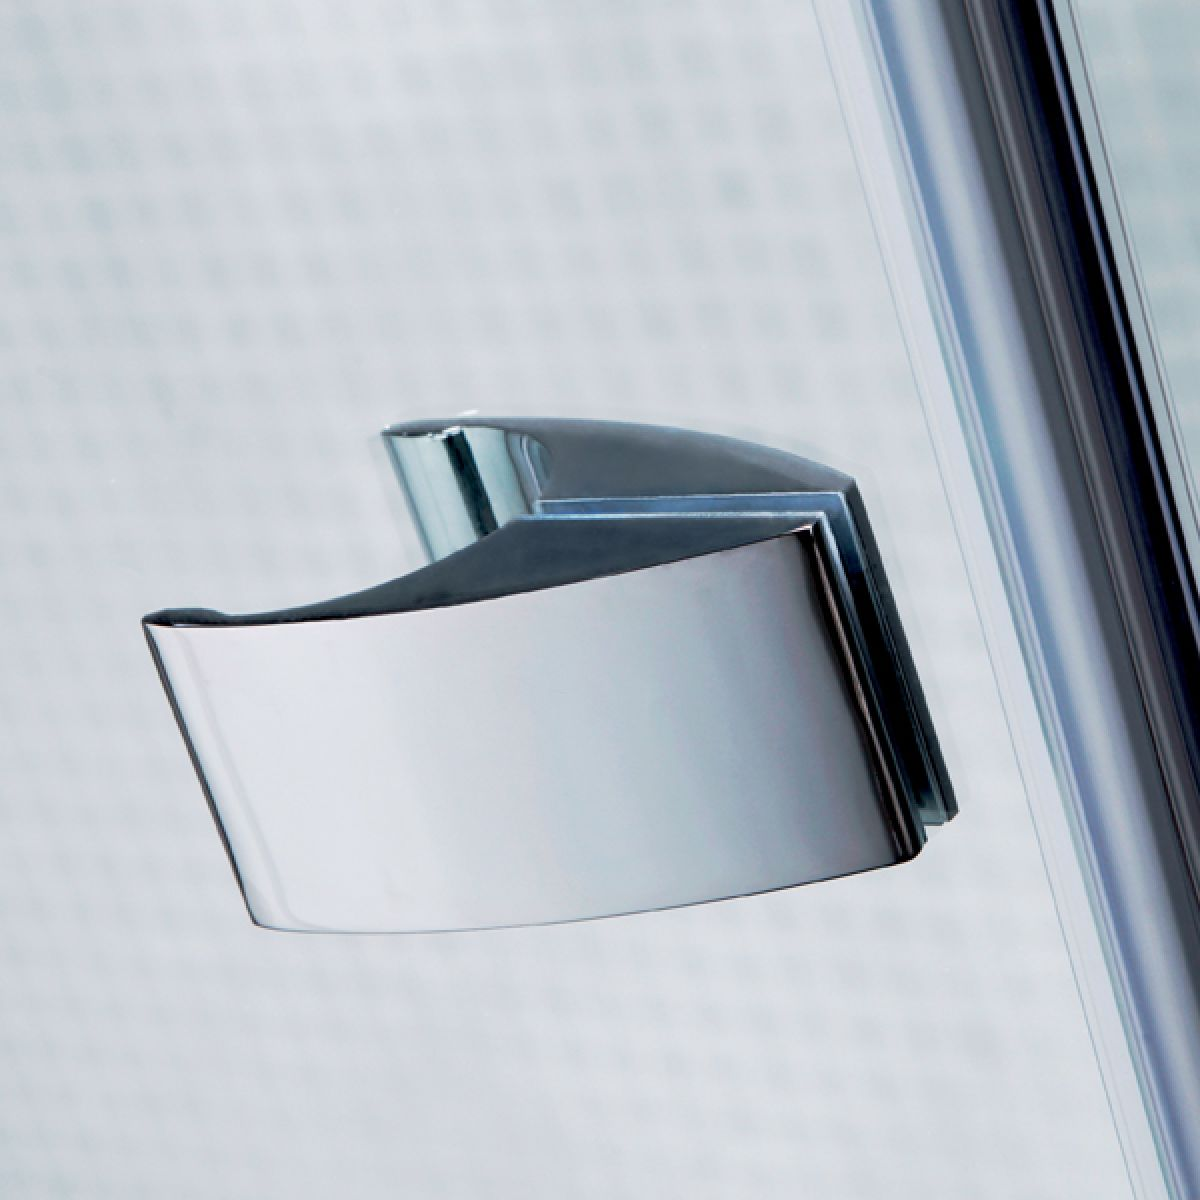 Prestige2 Frameless Hinged Shower Door with Optional Side Panel Detail 1